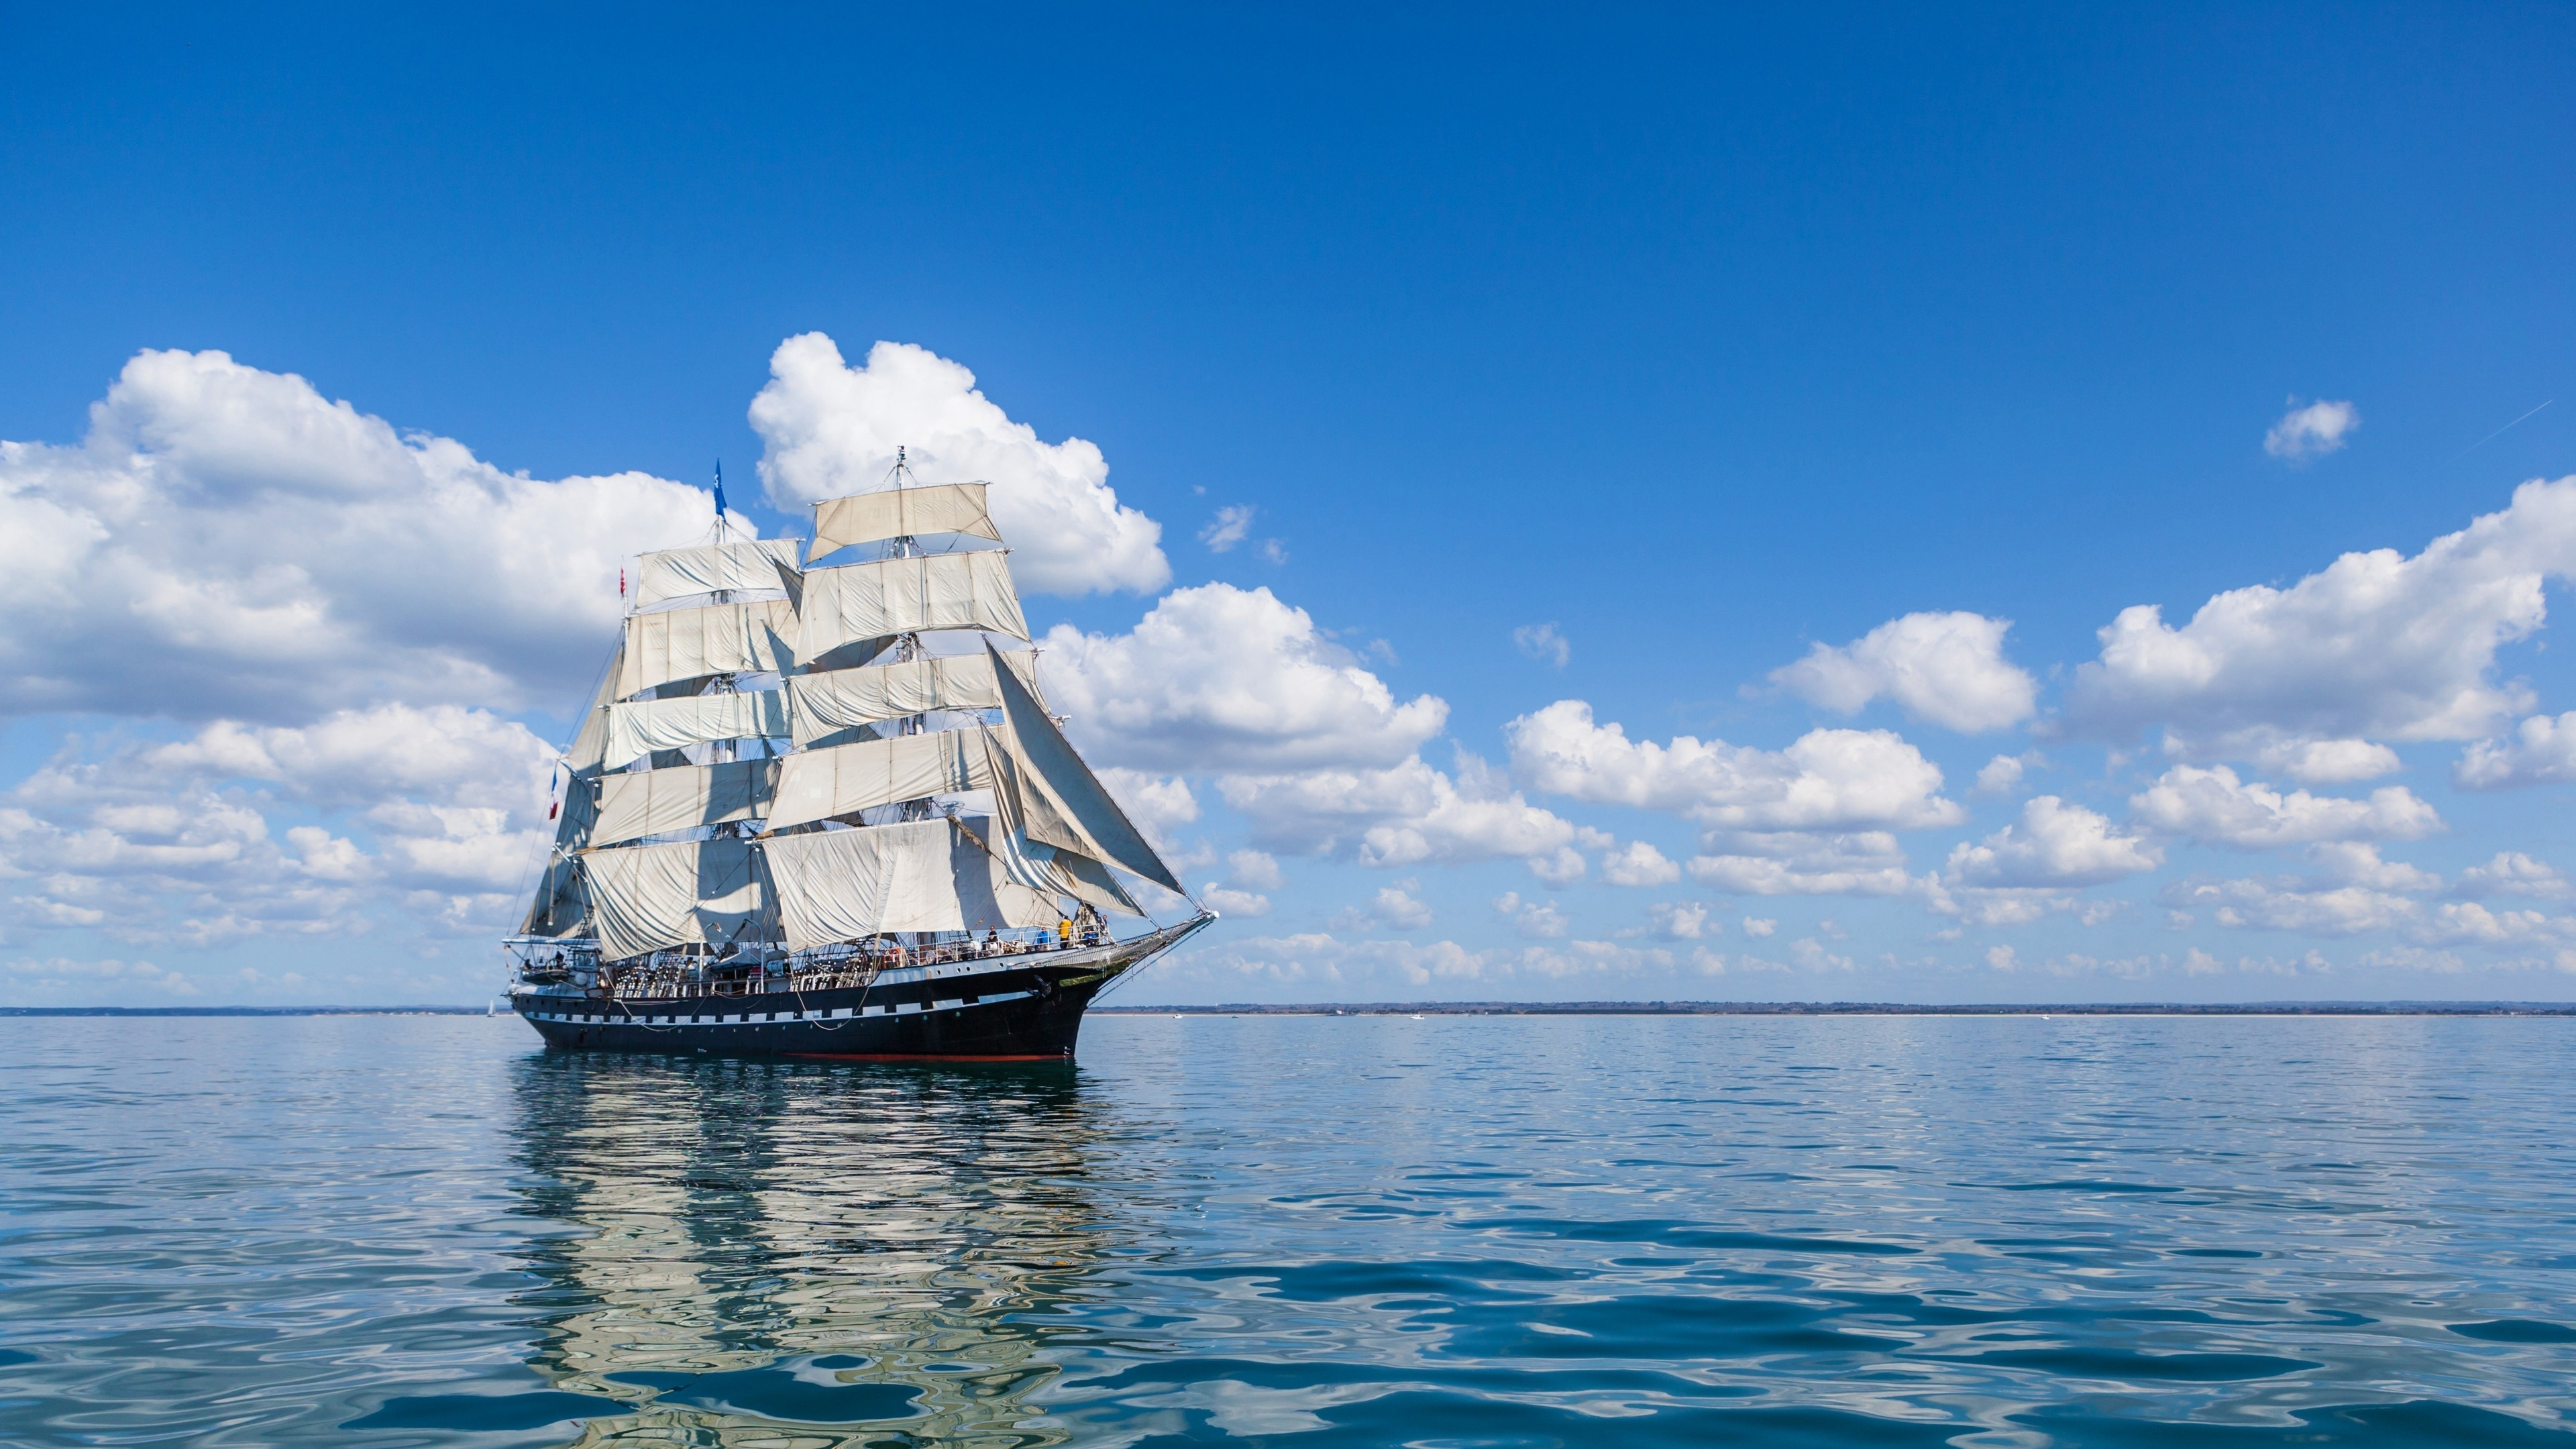 … Background 4K Ultra HD. Wallpaper sea, sail, ship, clouds